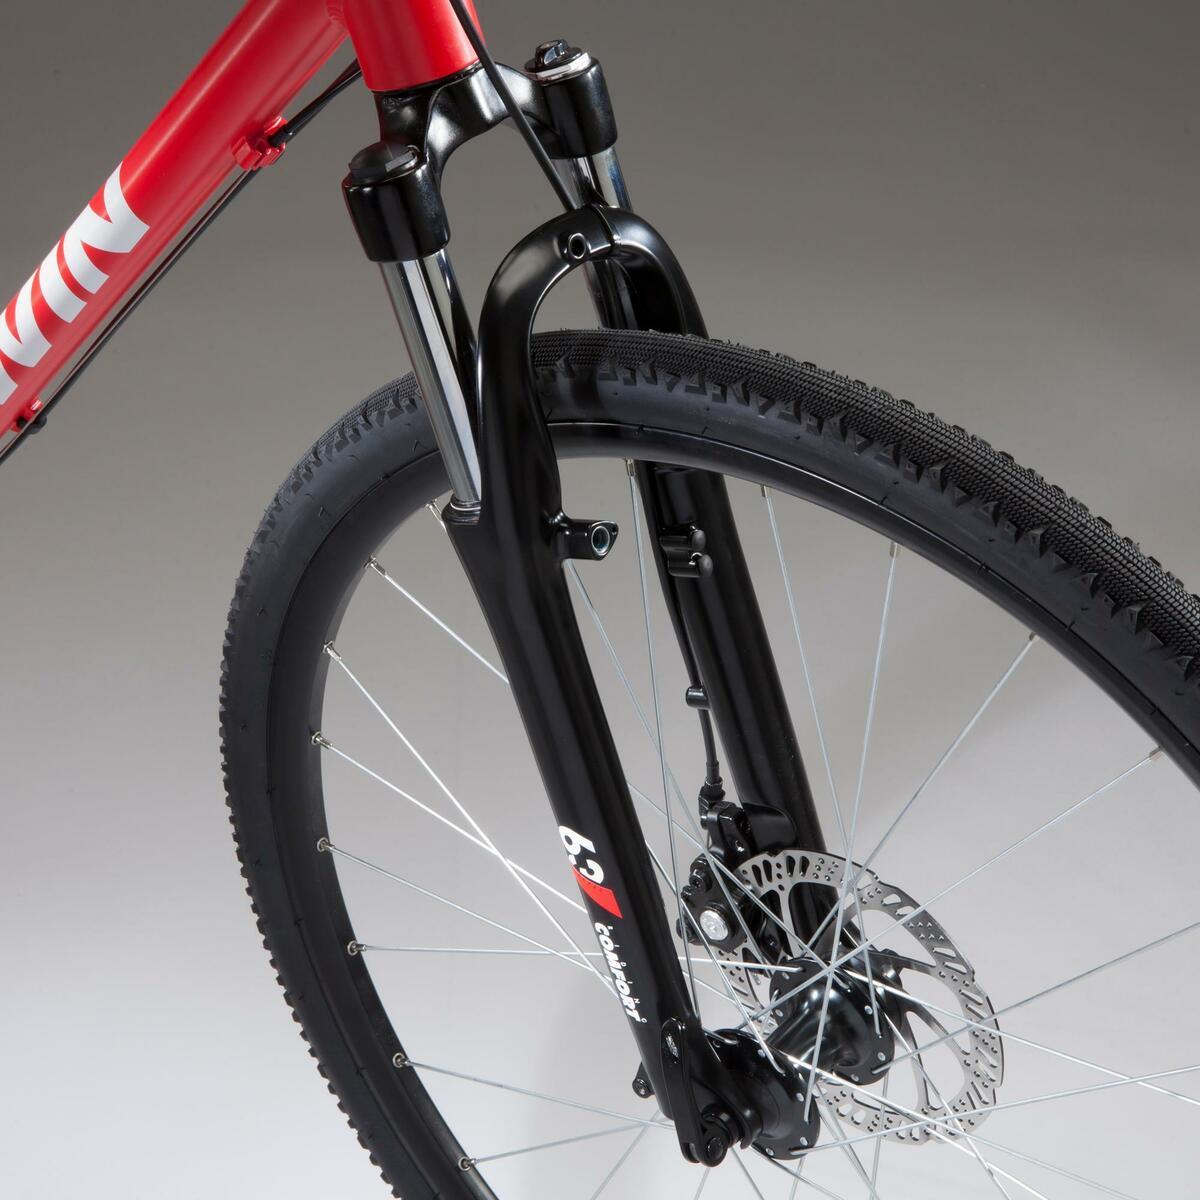 Bild 5 von Cross Bike 28 Riverside 500 Alu rot